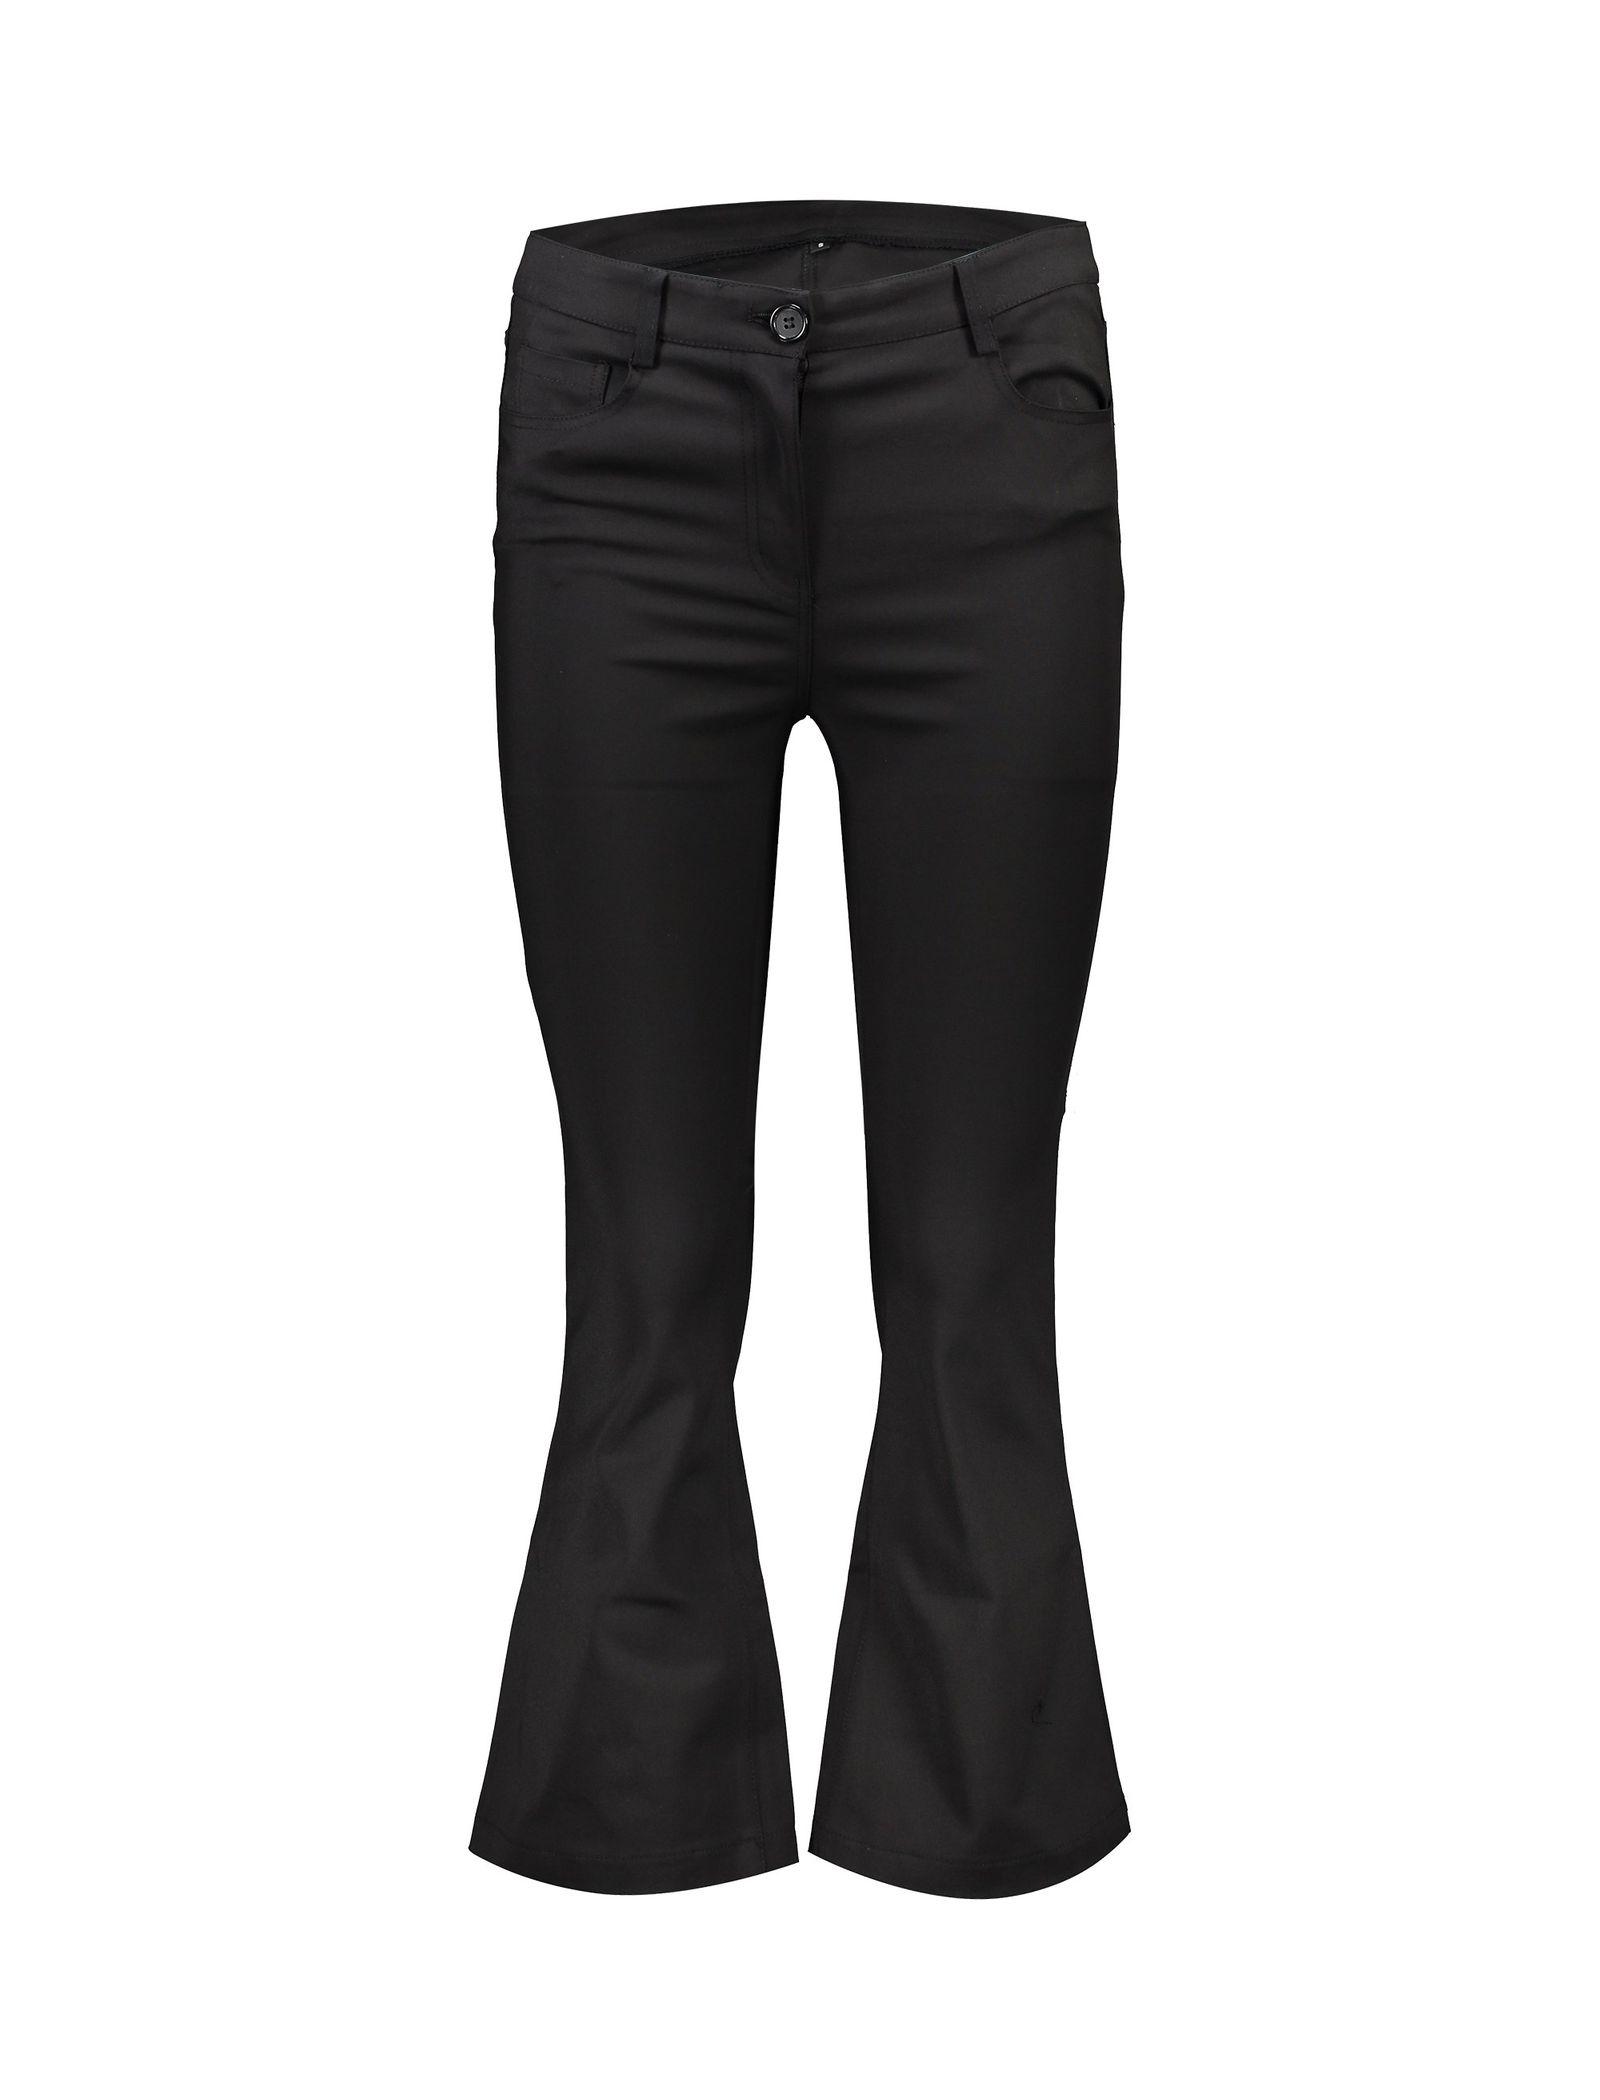 شلوار جین دمپا گشاد زنانه - یو یو - مشکي - 1